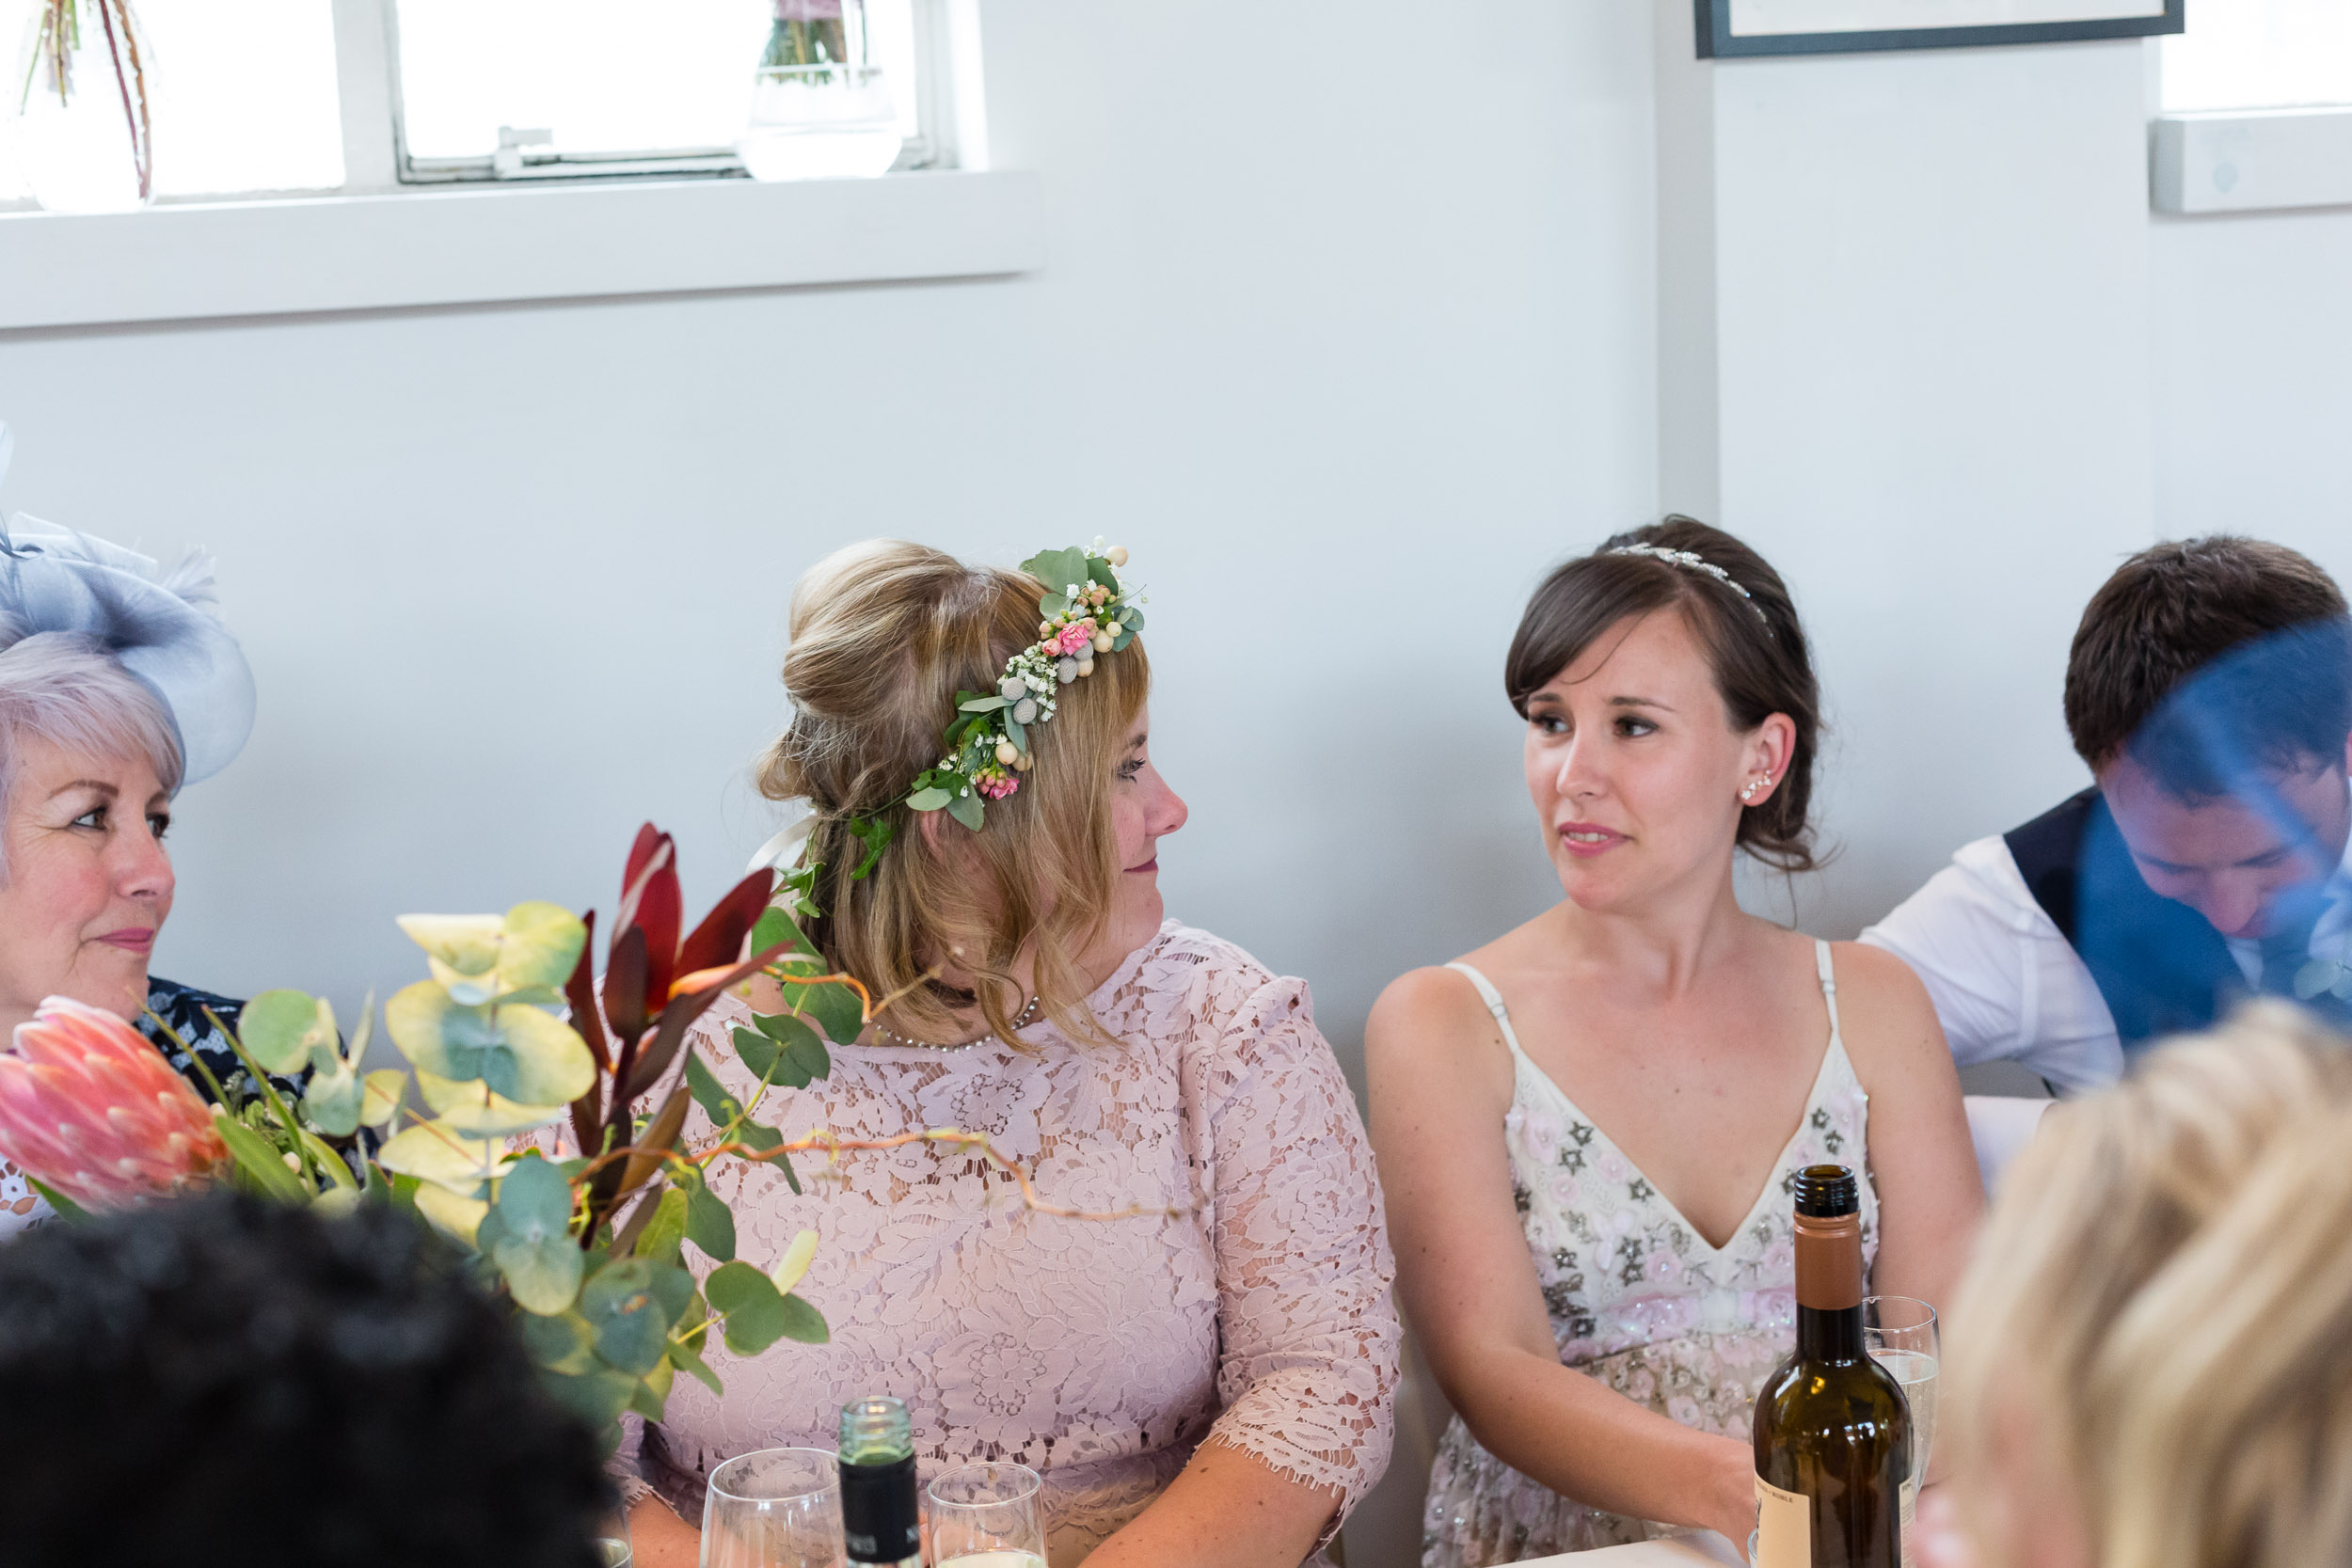 brockwell-lido-brixton-herne-hill-wedding-330.jpg